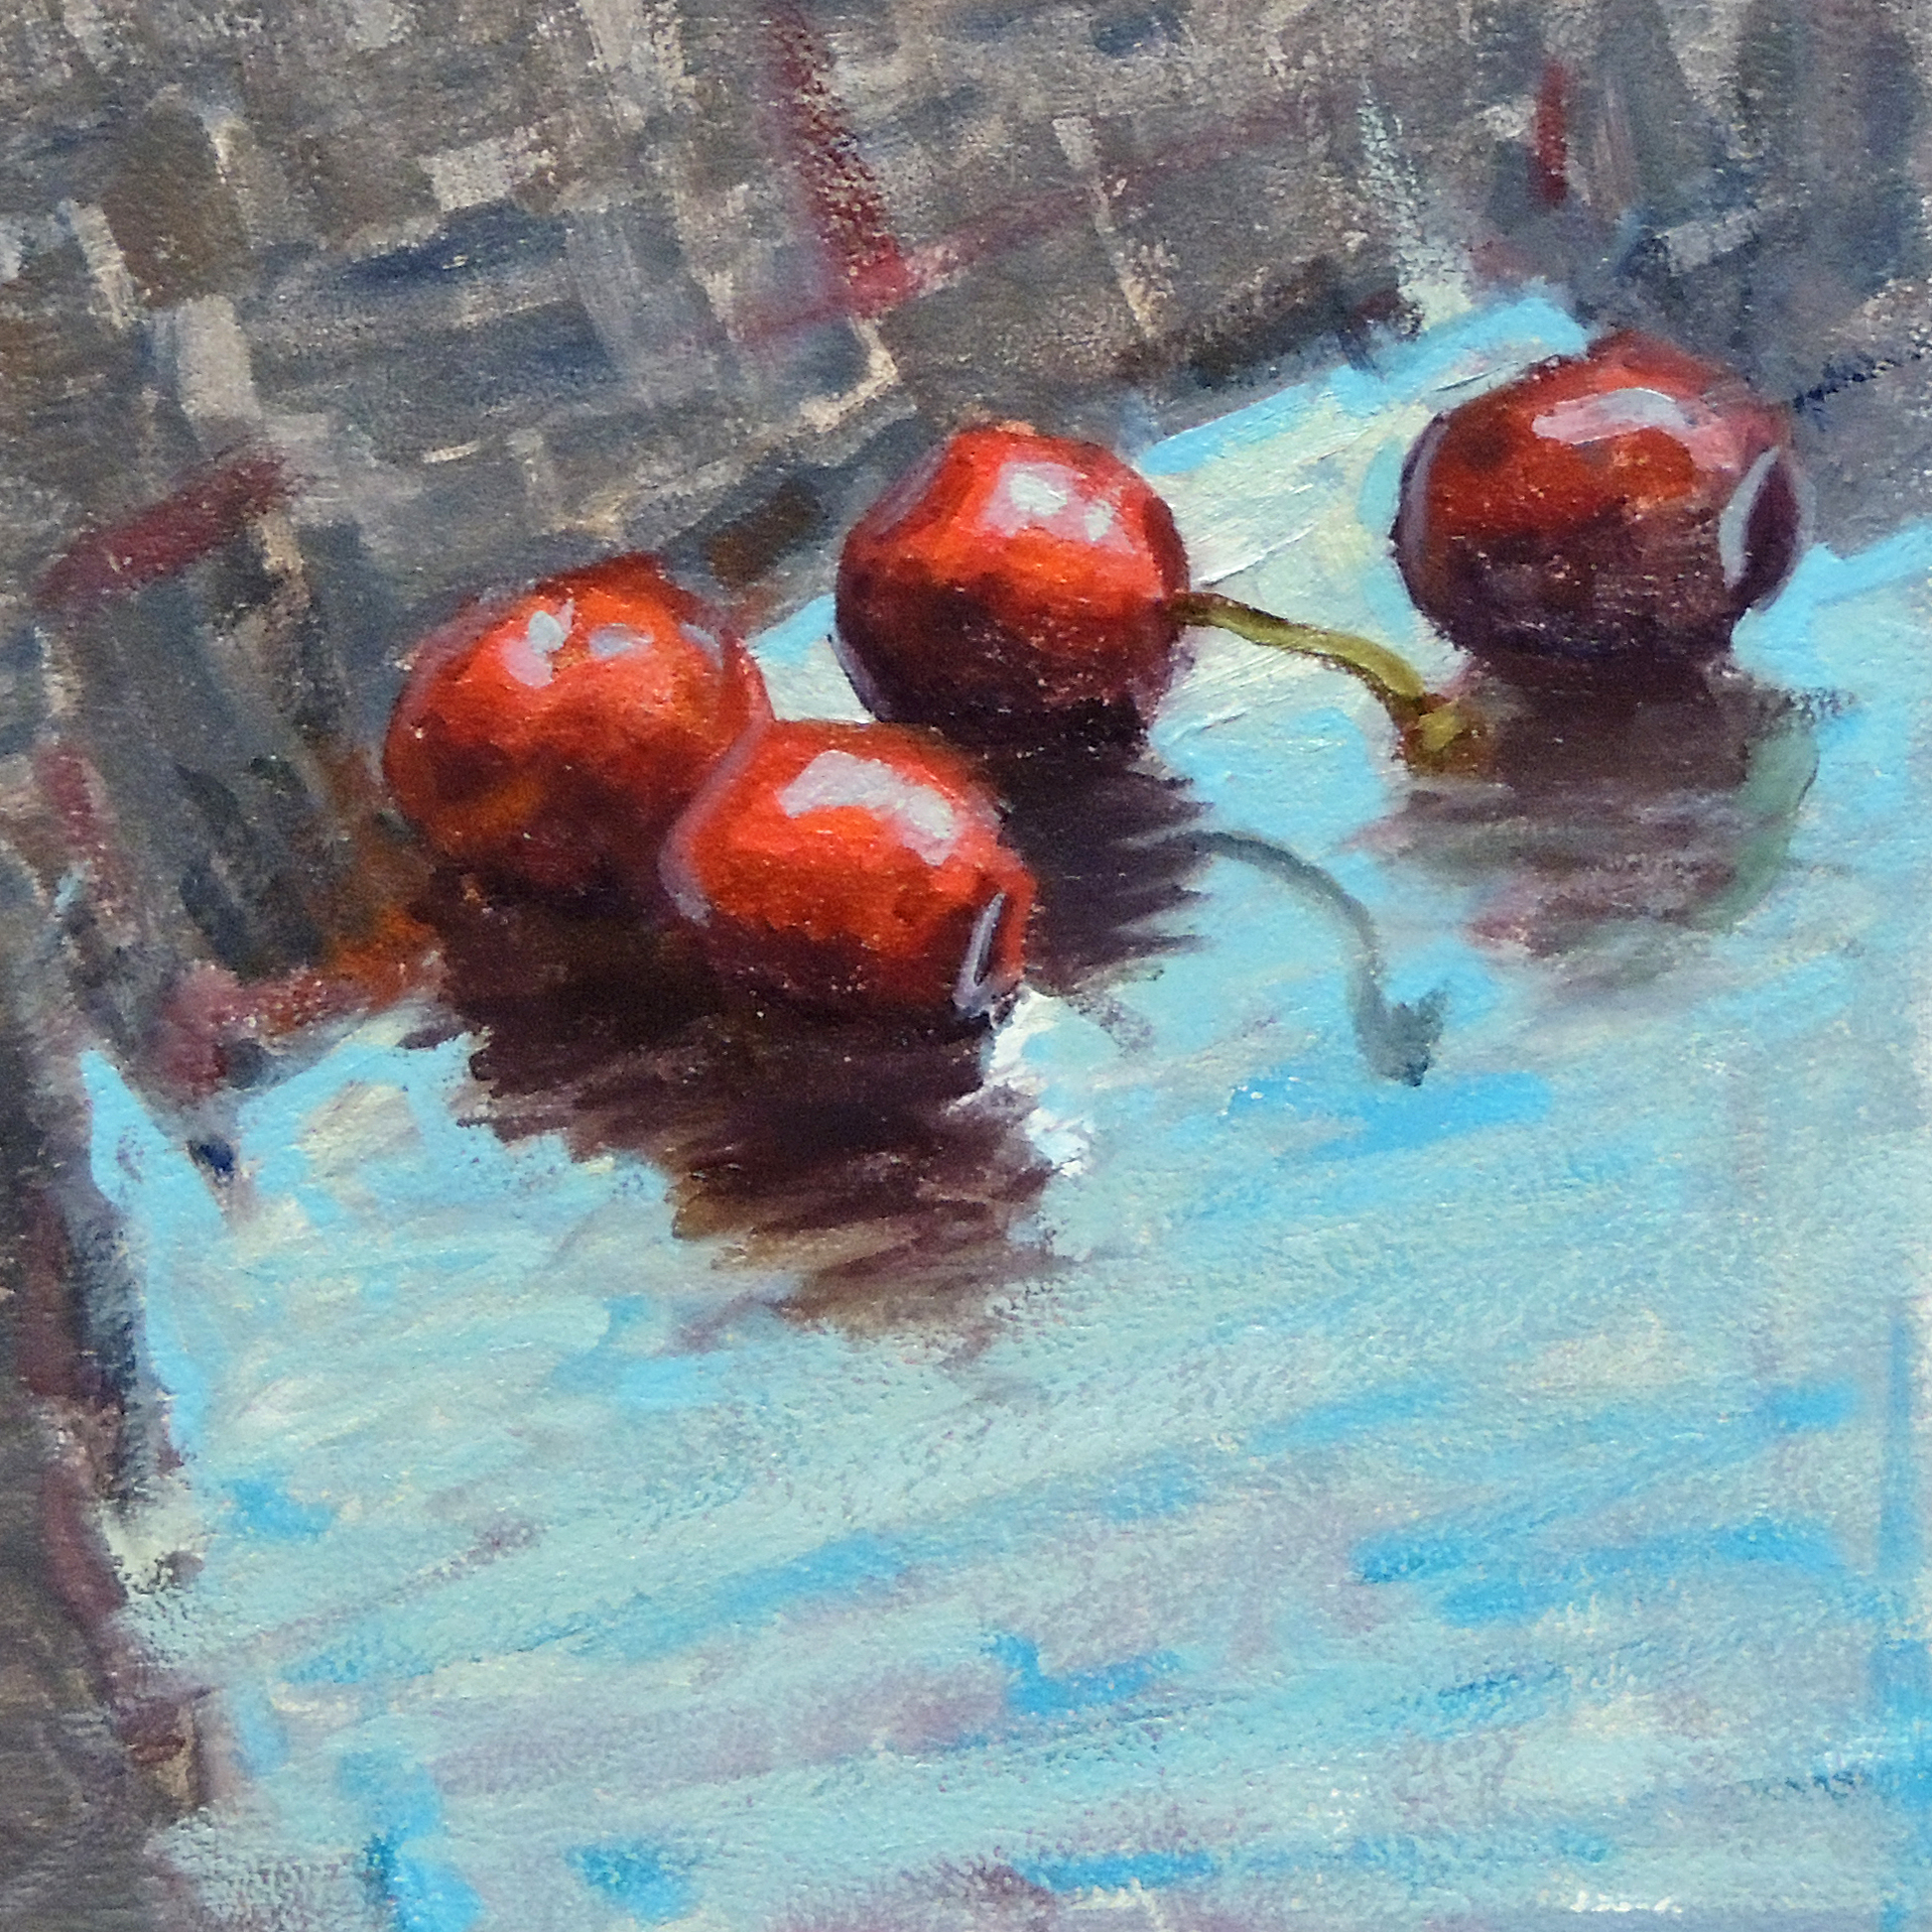 Summer's Cherries 8x8